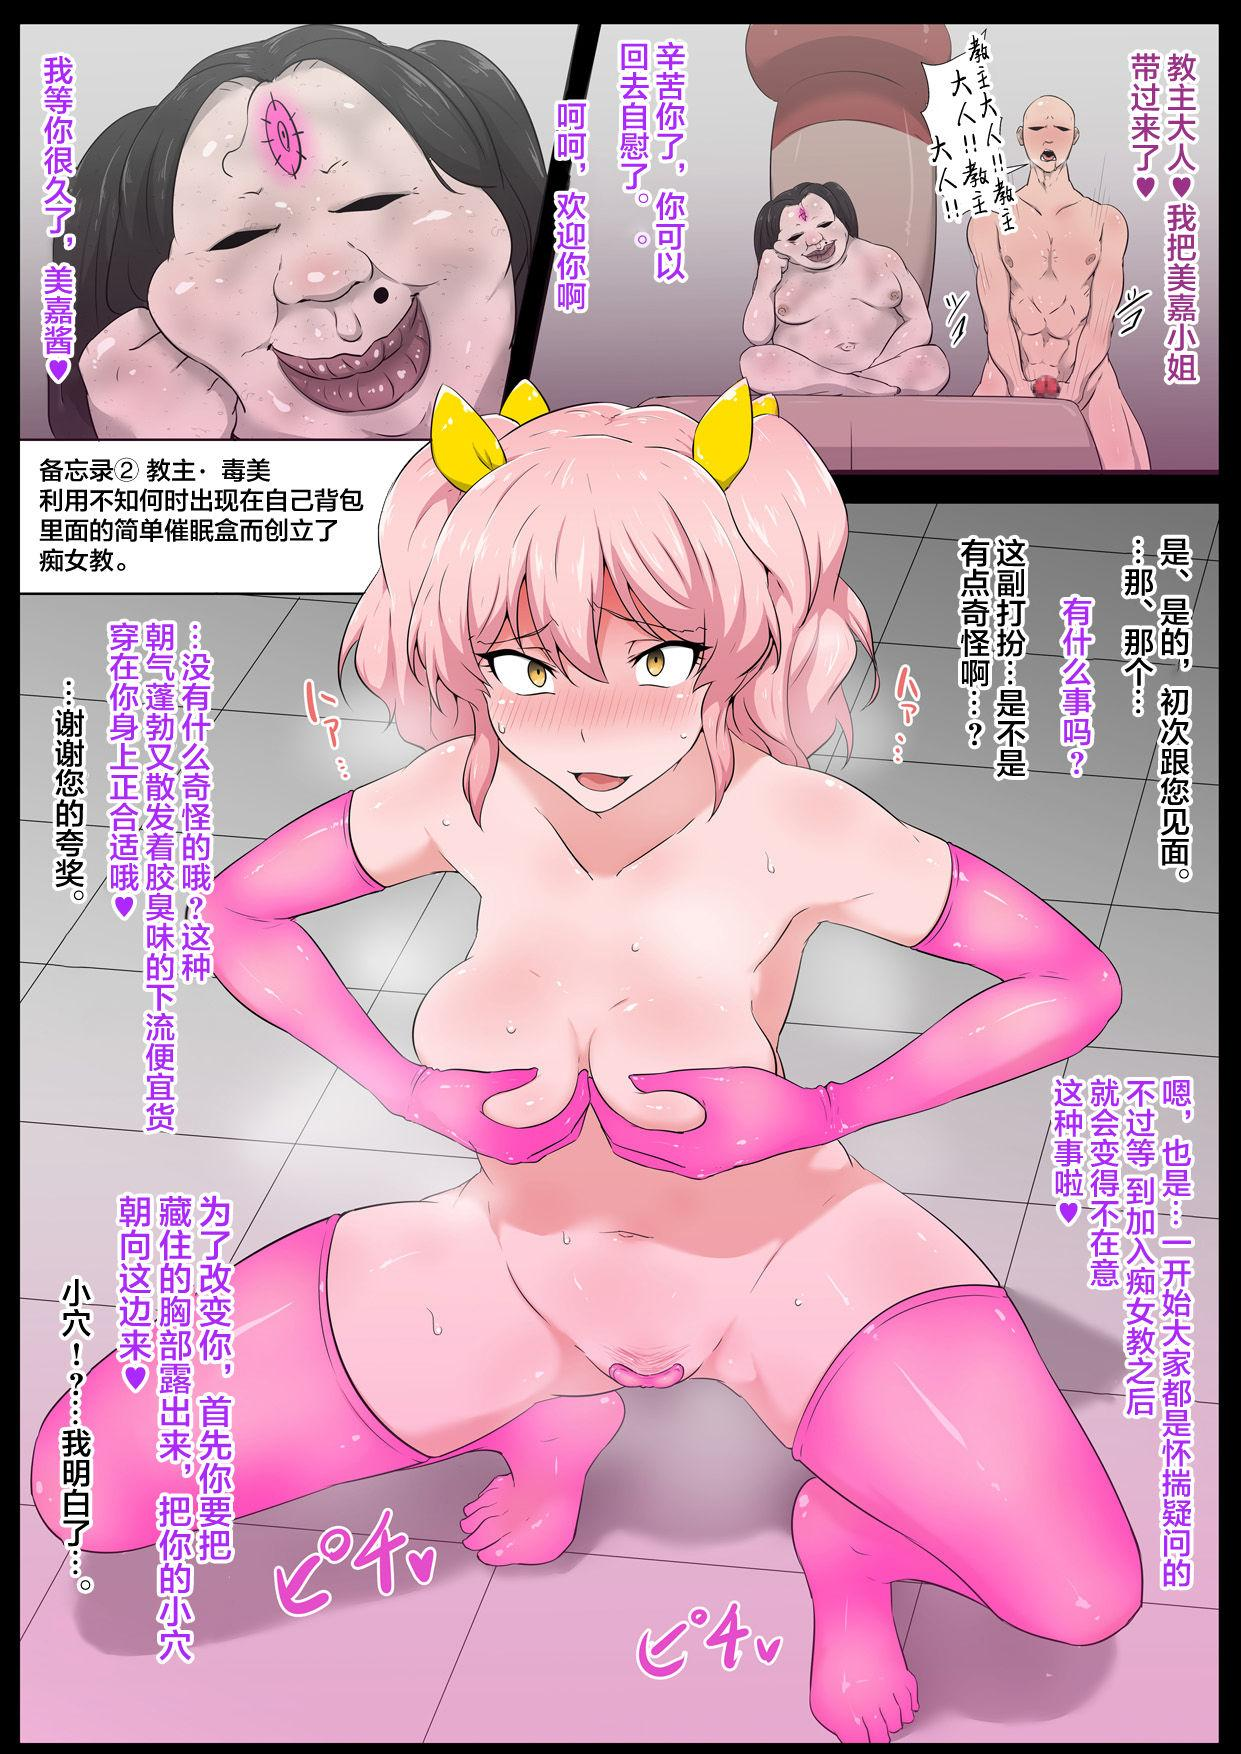 Kurakute Semai Seihekisho Vol. 2 Saimin Sennou 2